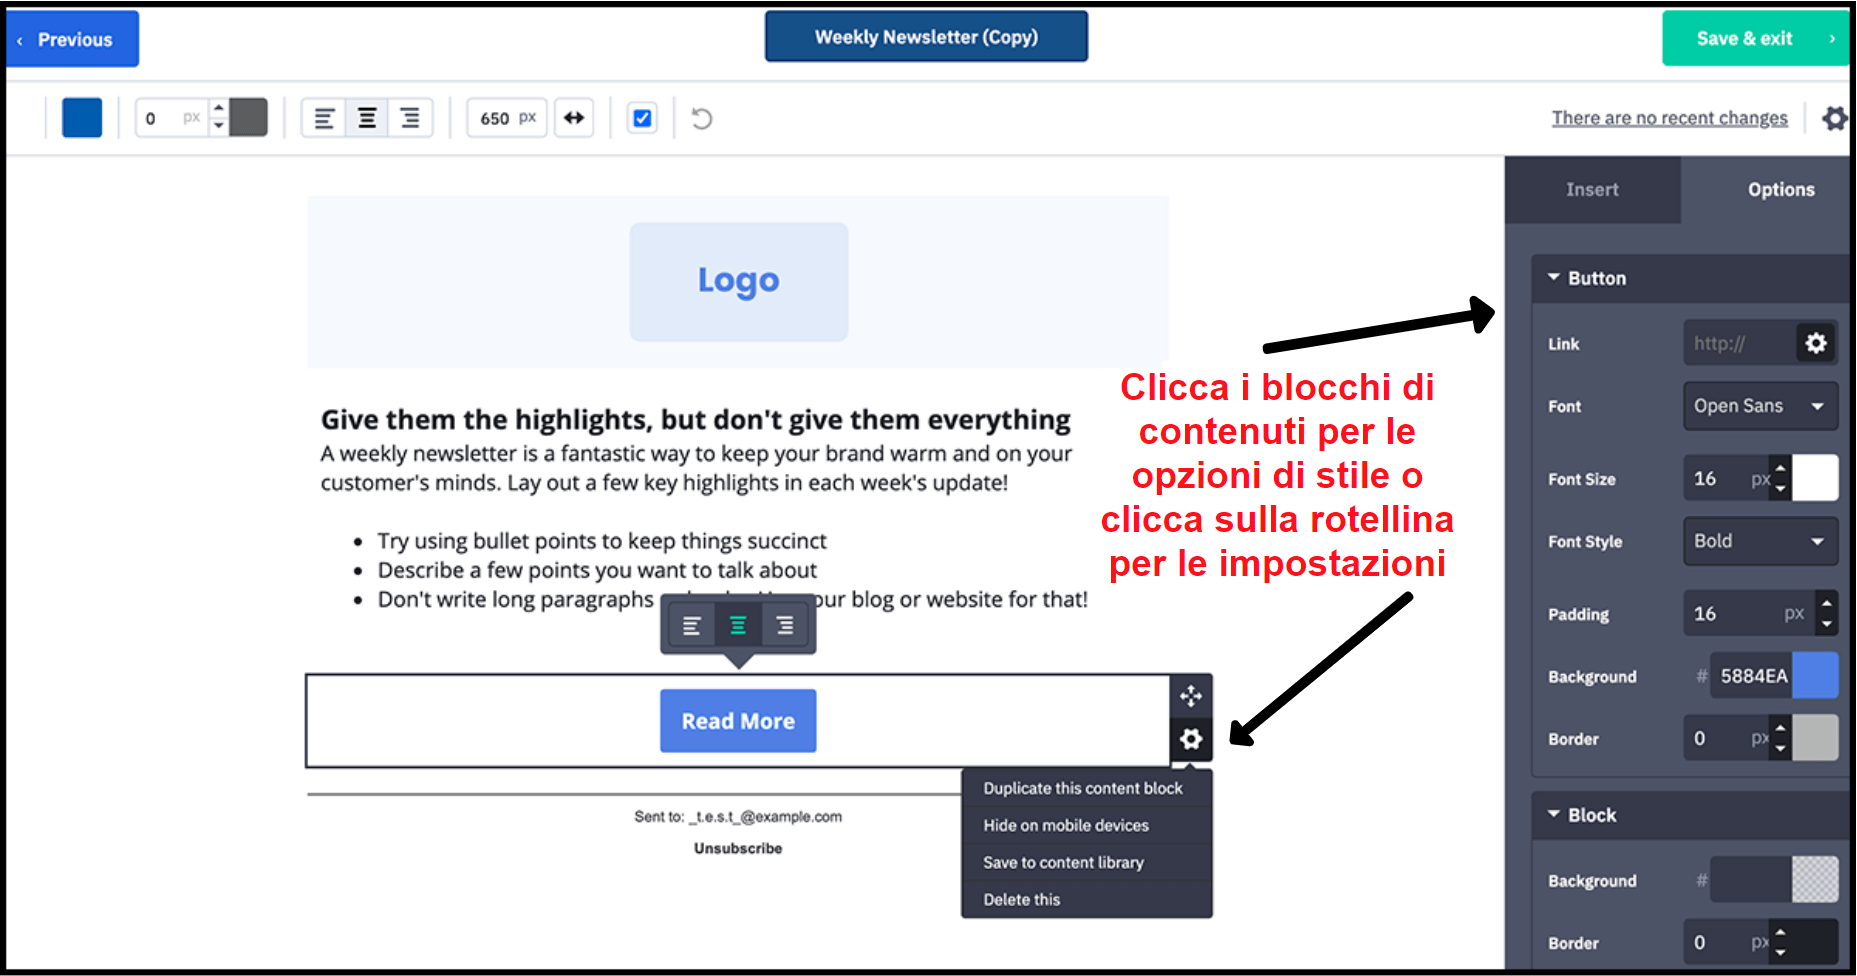 ActiveCampaign drag-and-drop editor